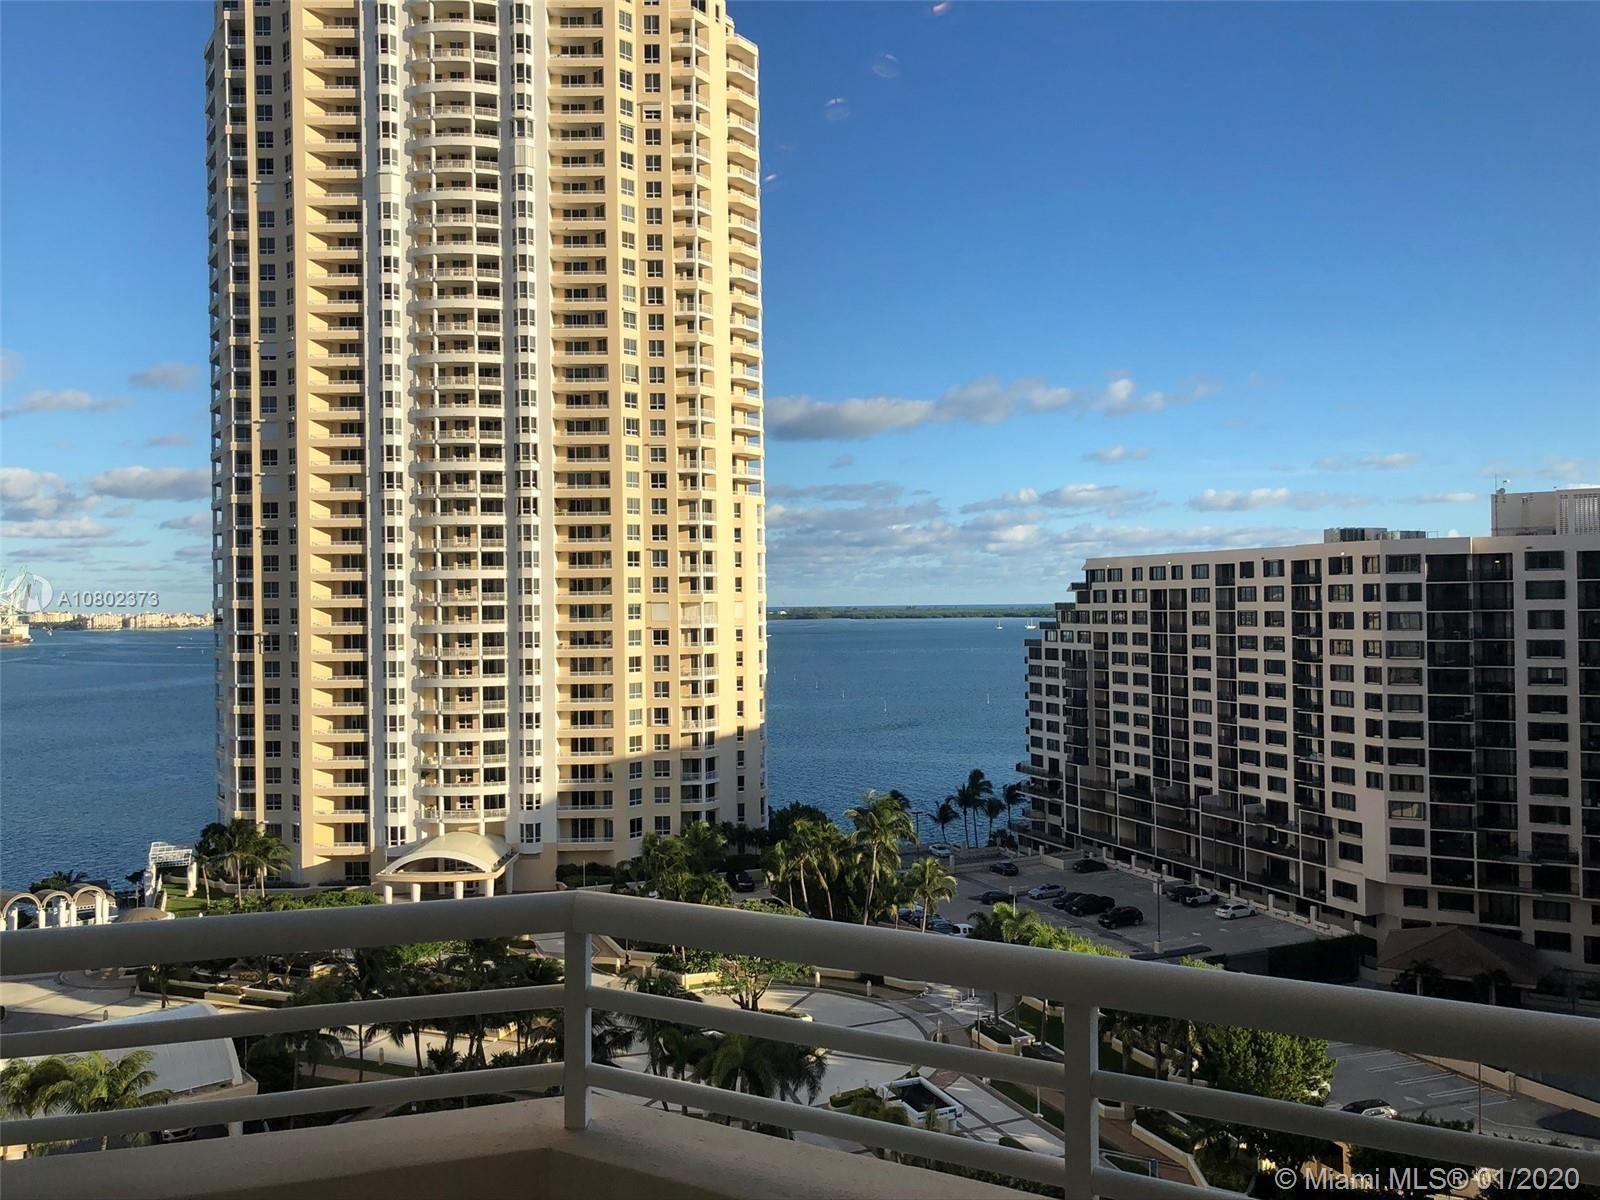 888 Brickell Key Dr #1609, Miami, FL 33131 - #: A10802373